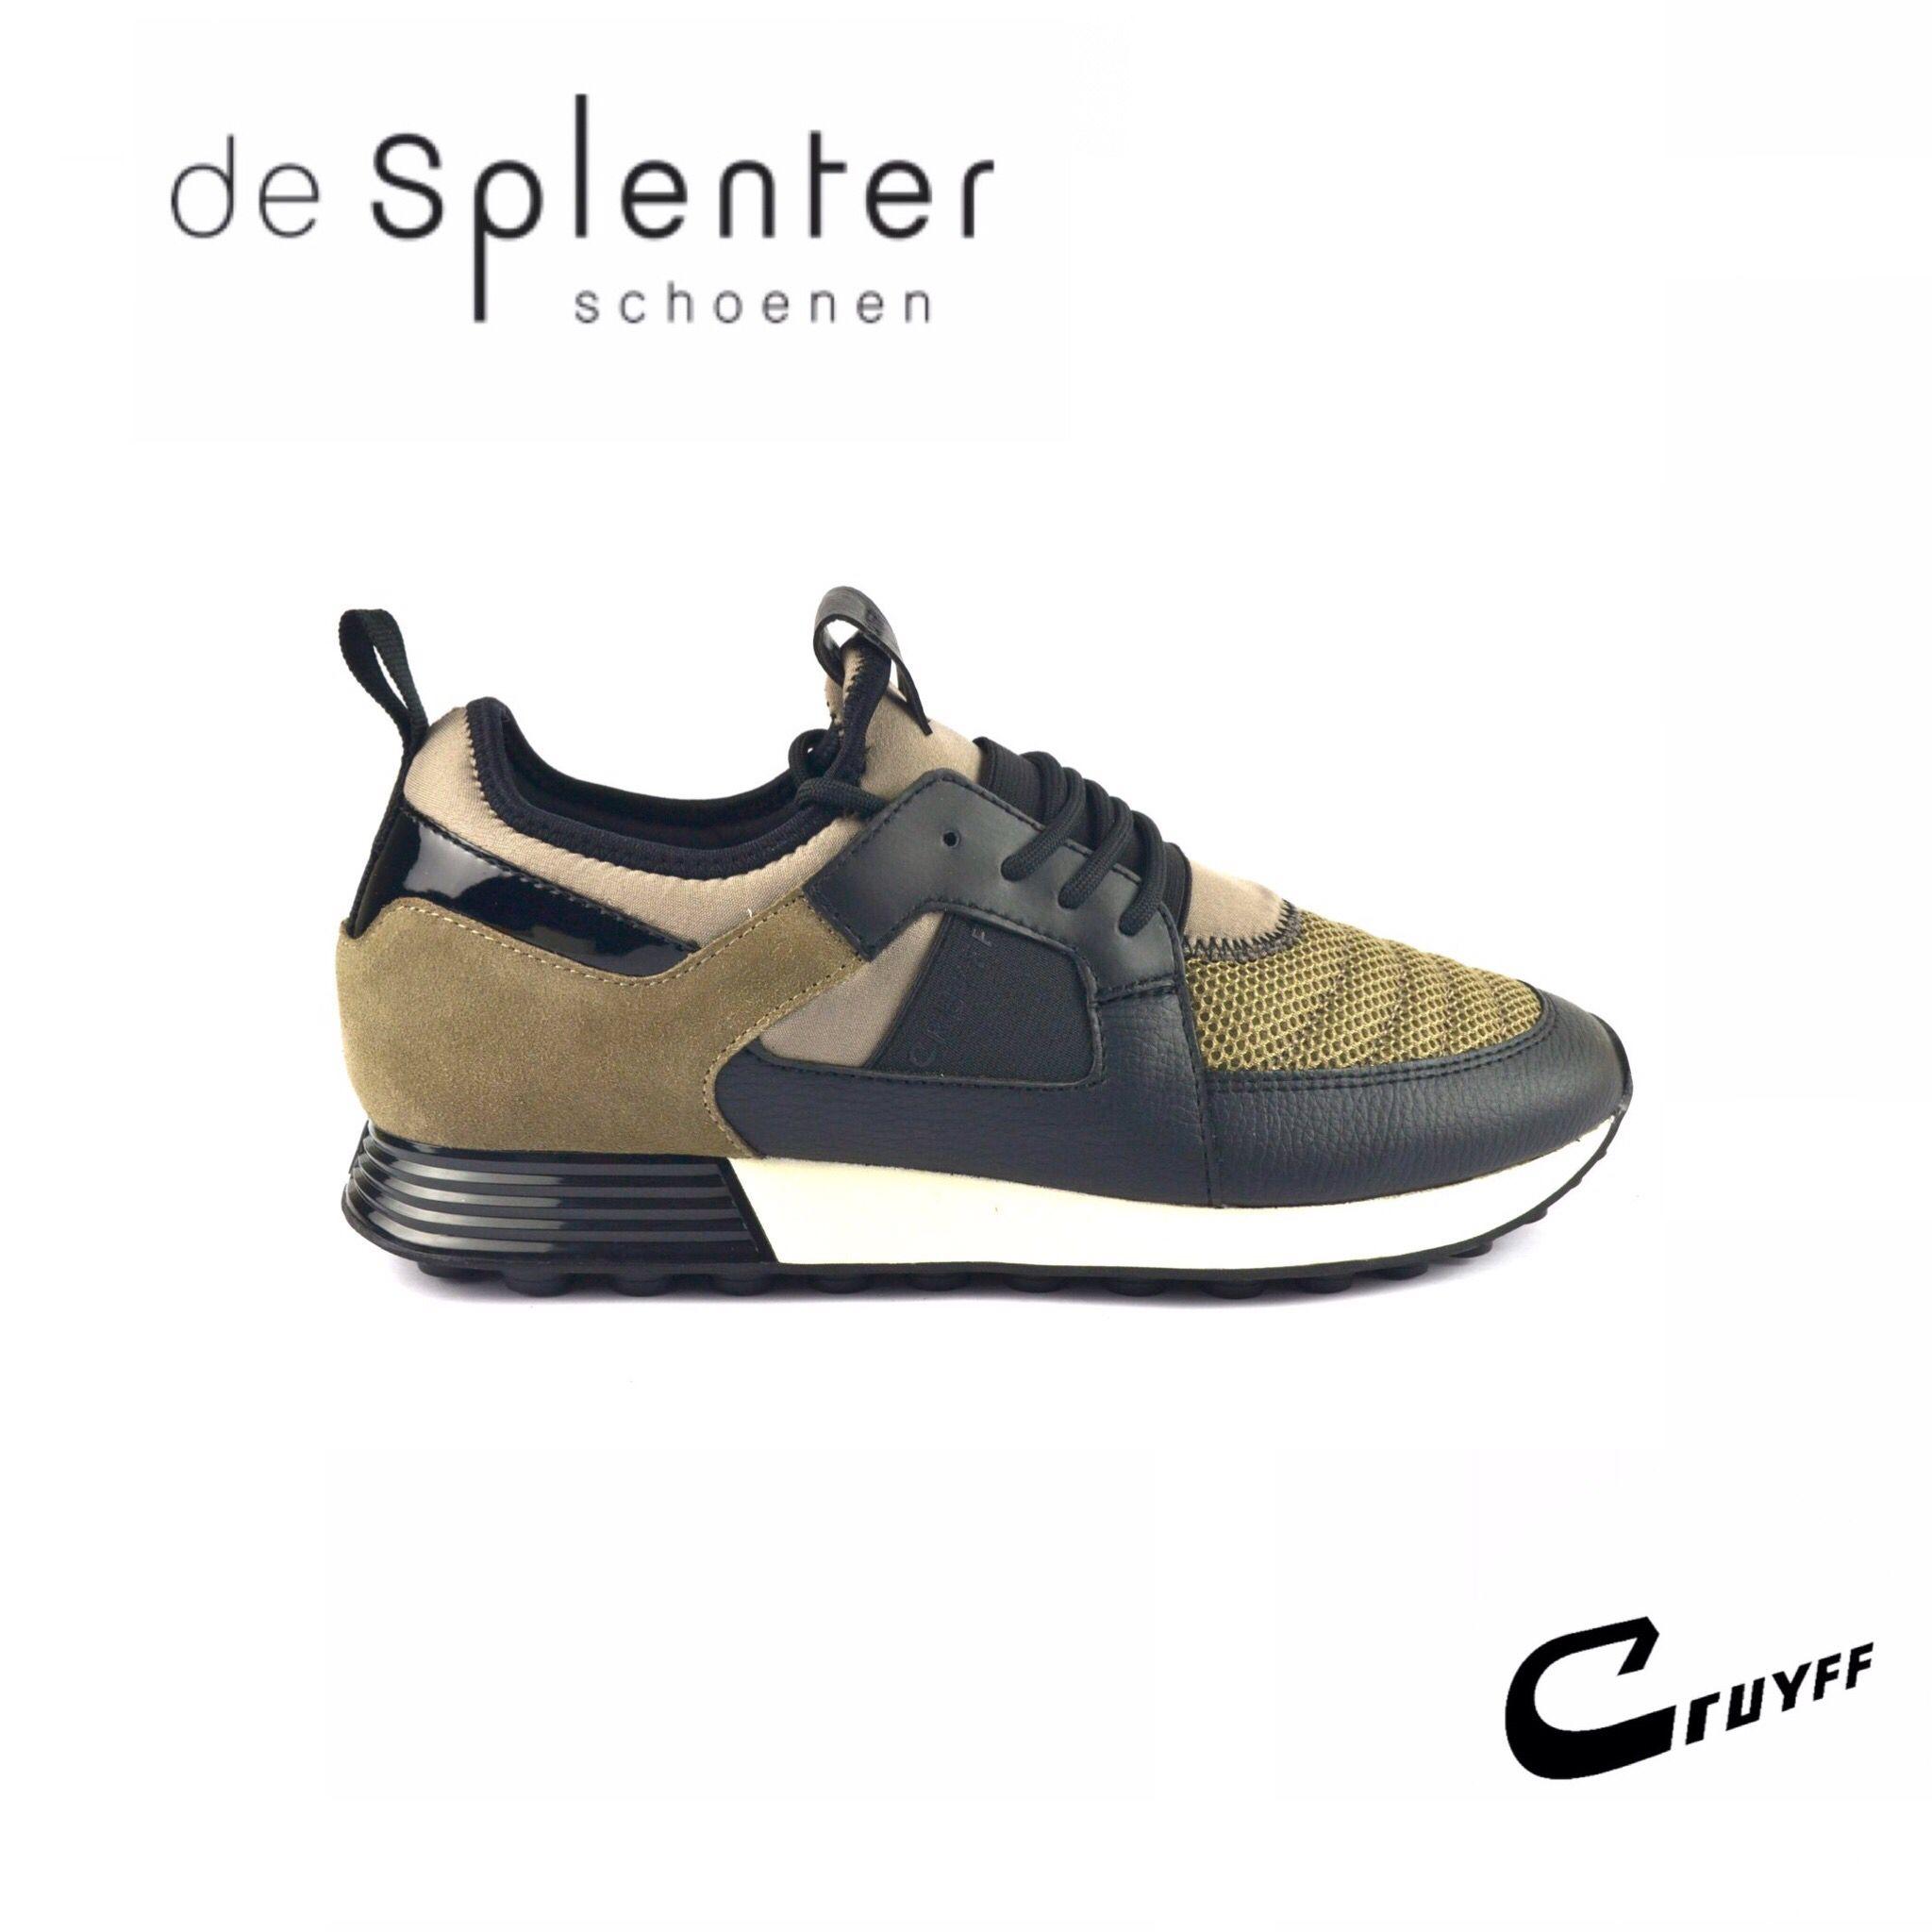 009976961be Met Floris van Bommel boots of sneakers. Nu SALE! #sale #desplenterschoenen  #florisvanbommel #… | Autumn/winter | Shoes & Fashion | Winte…